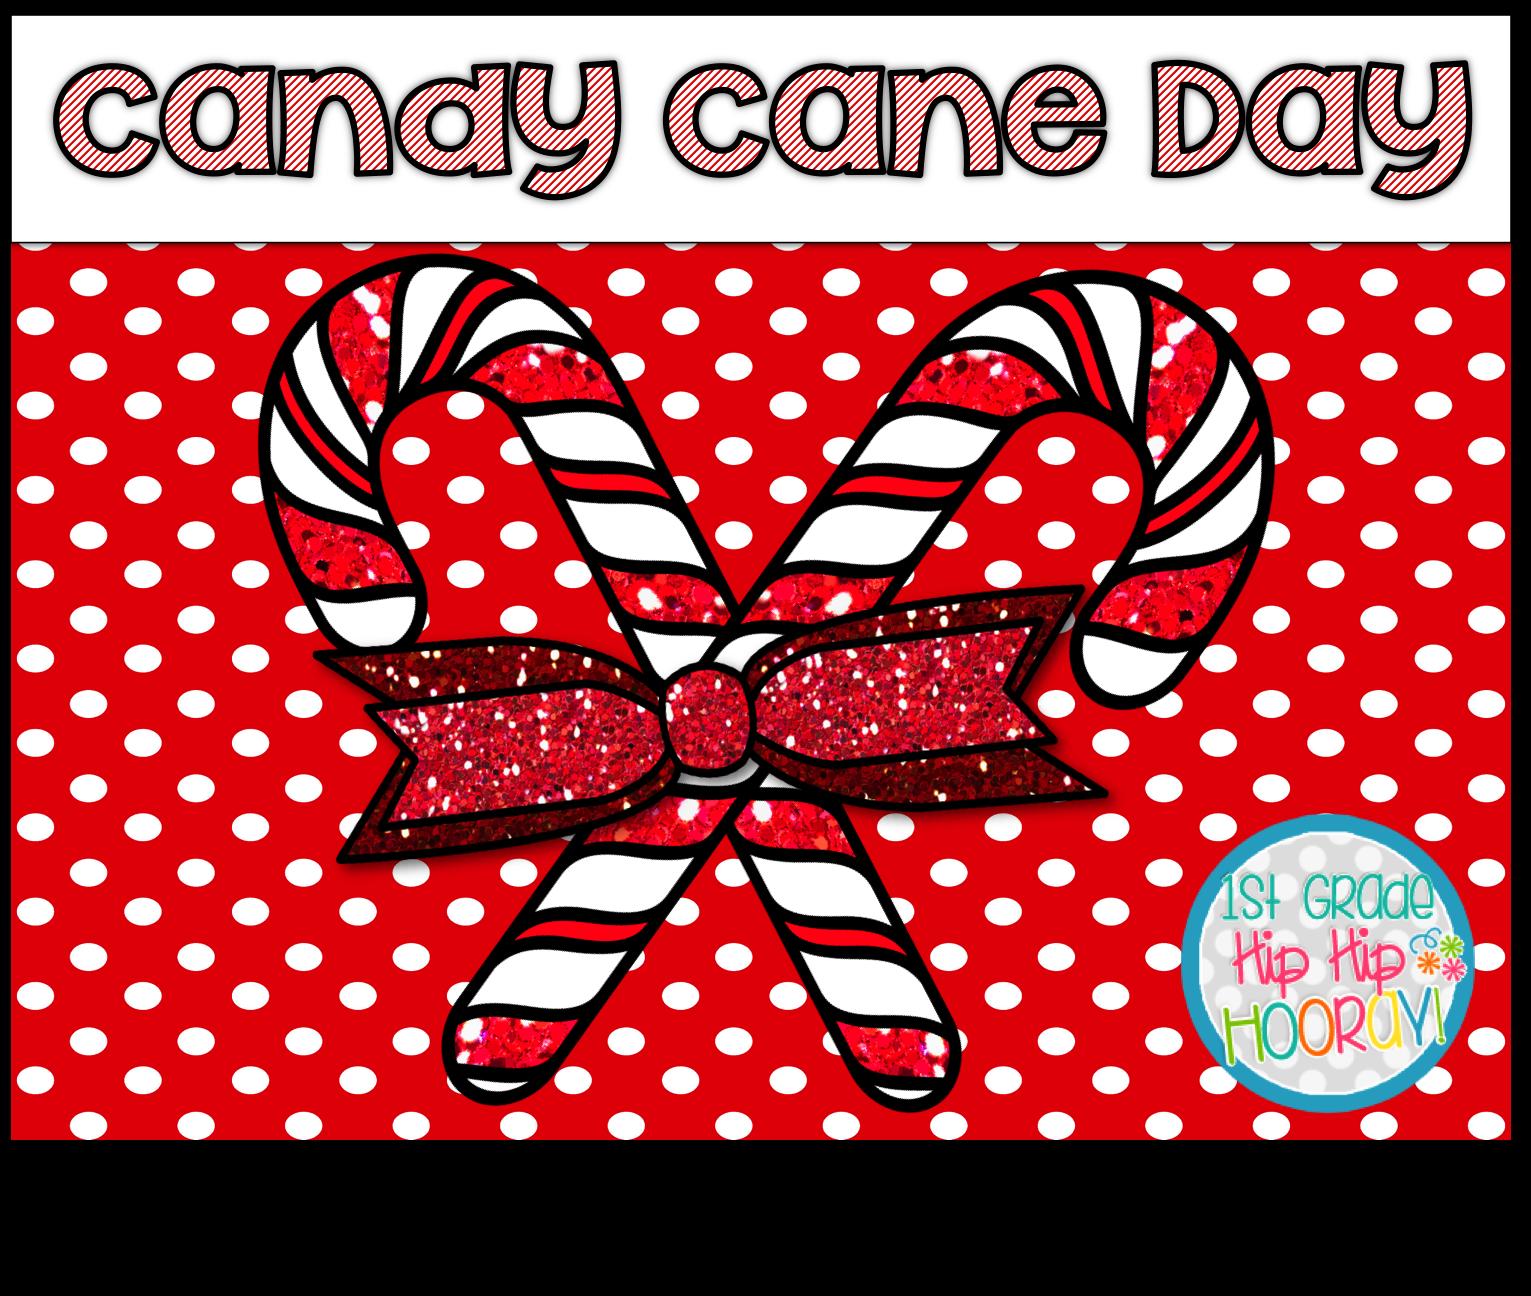 1st Grade Hip Hip Hooray Candy Cane Day